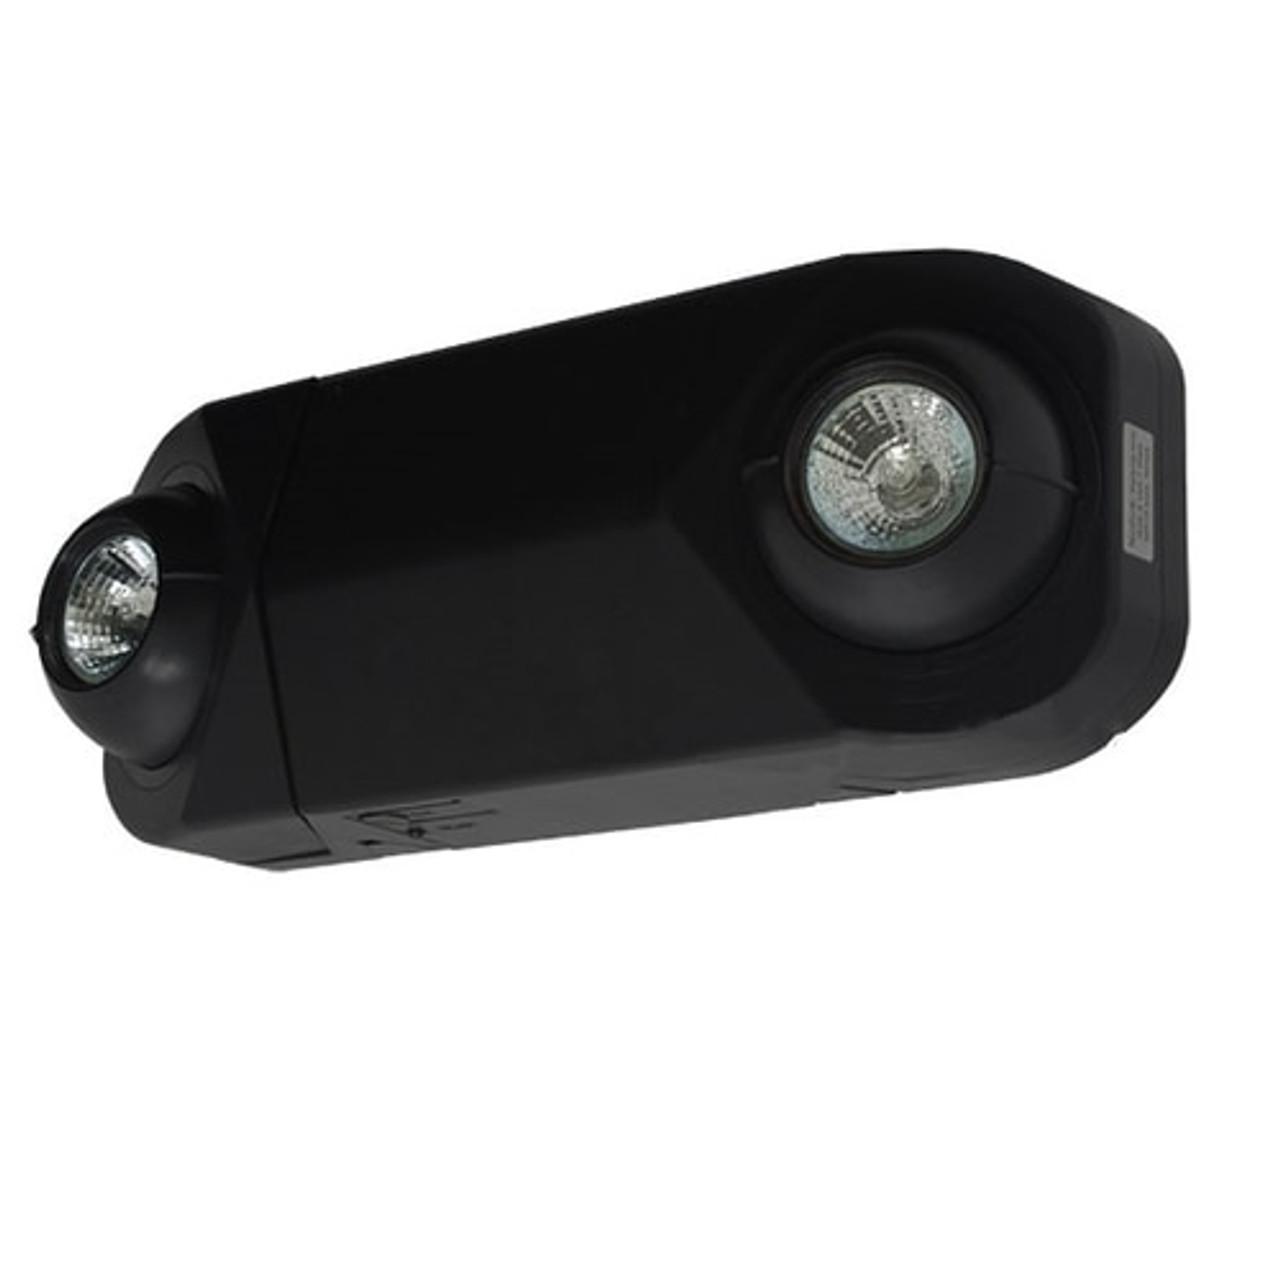 2 Head MR-16 Low Profile Halogen White Emergency Light Black